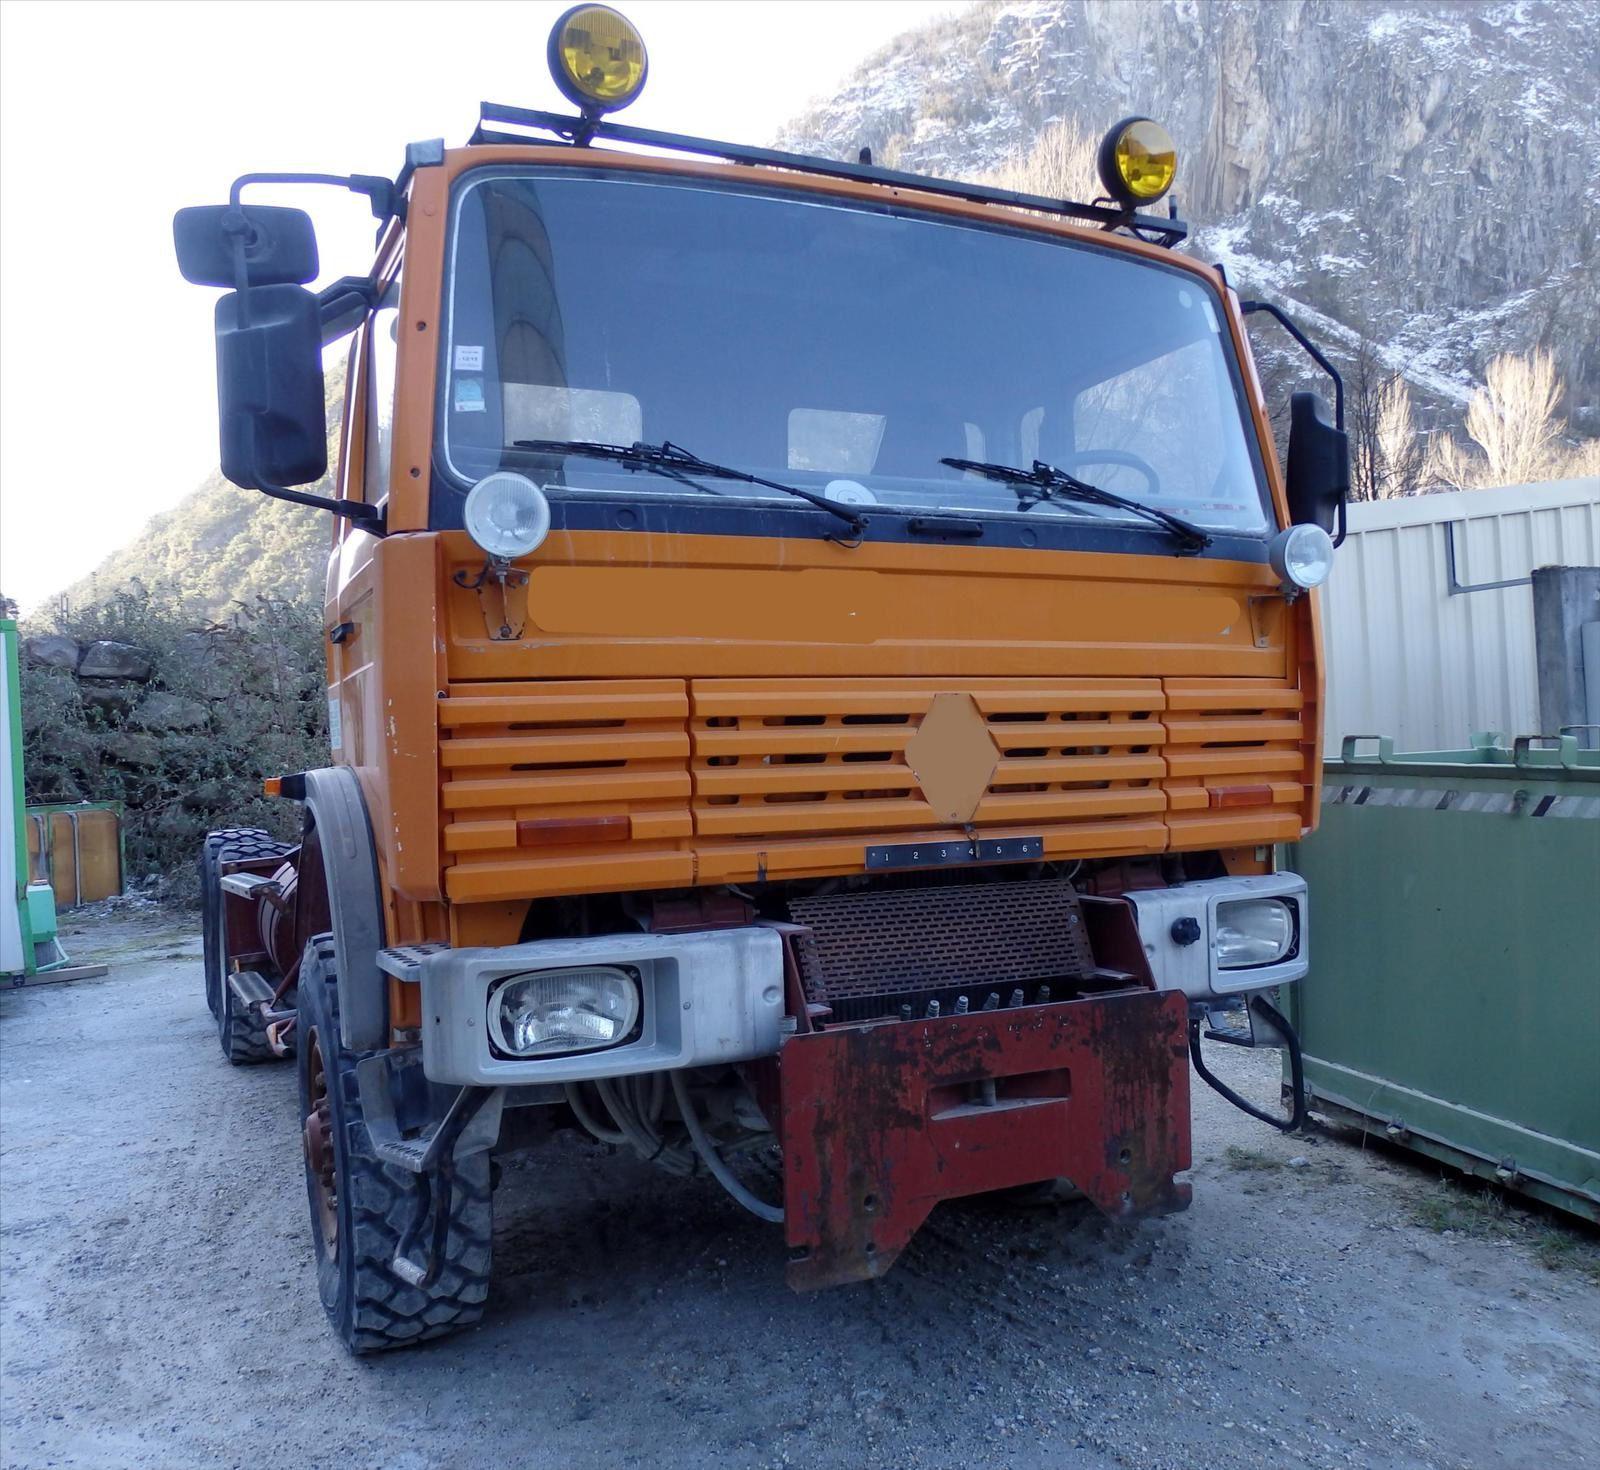 Camion THOMAS Renault  6x6  Pierre BASSAT TRANSCOMM13 Tel: 0608066192